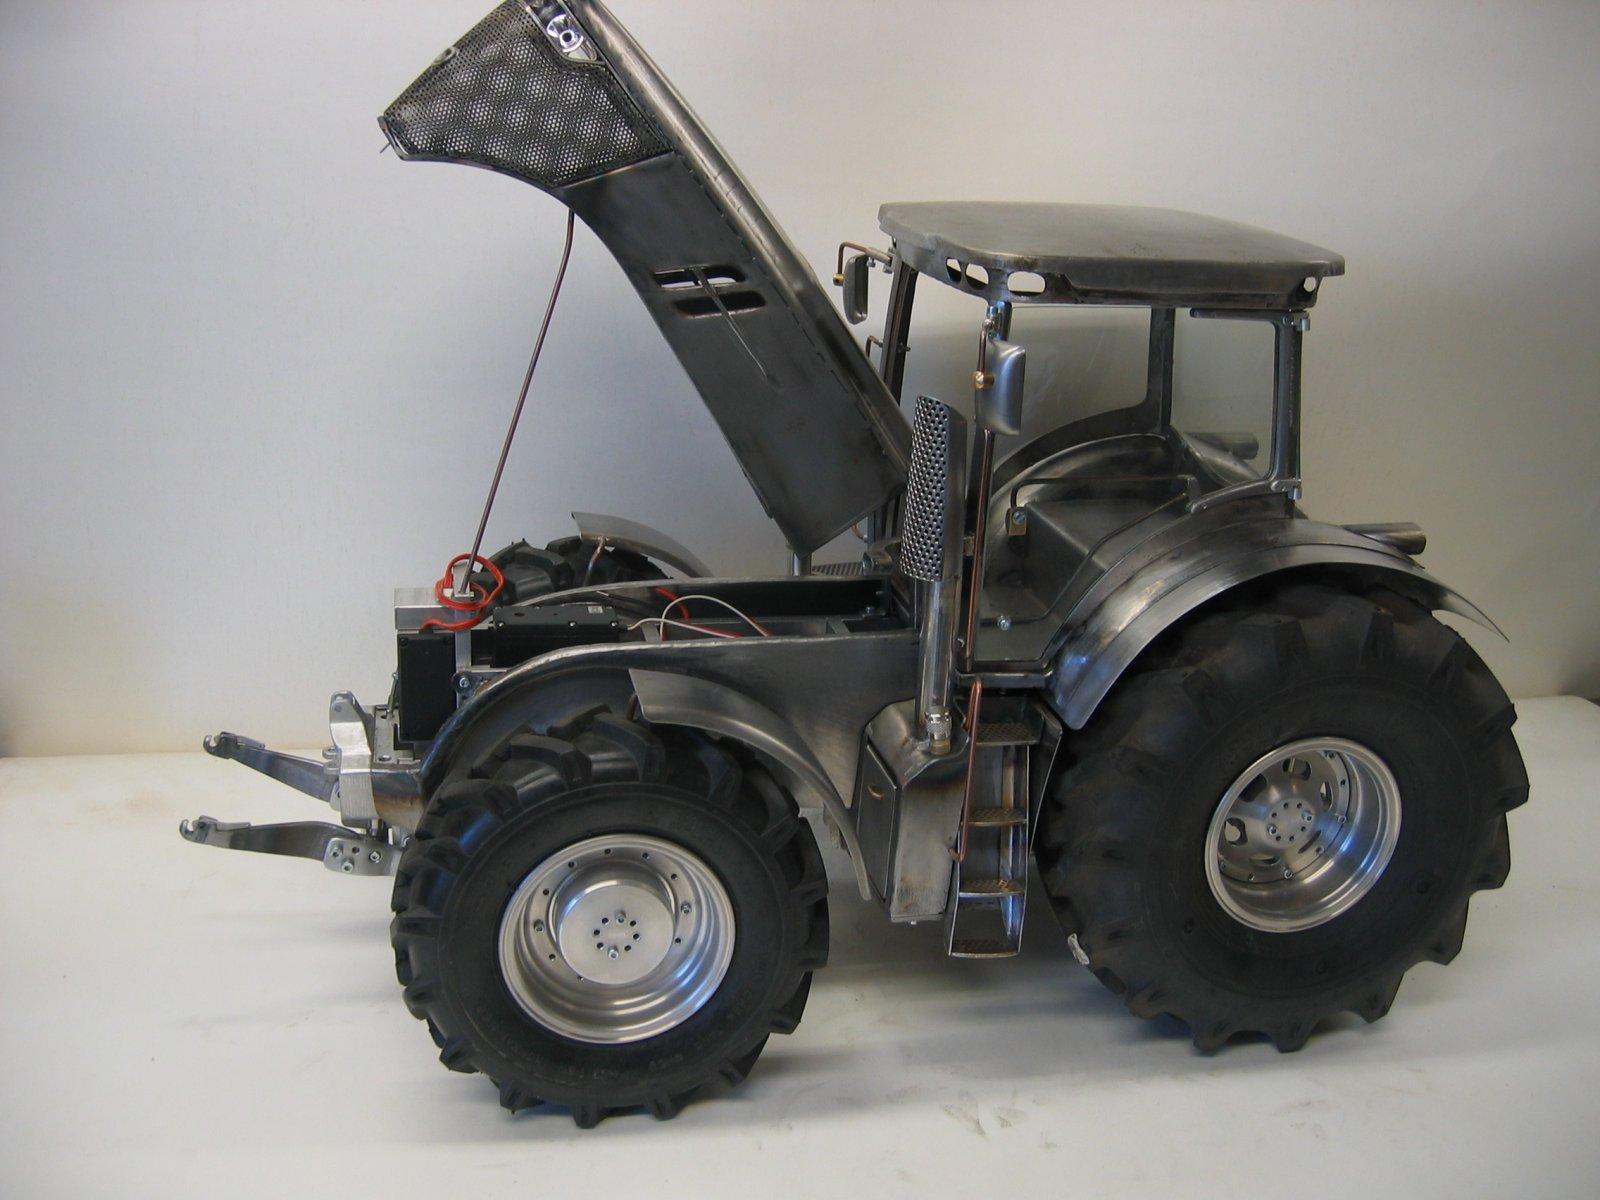 7280R-0247.JPG